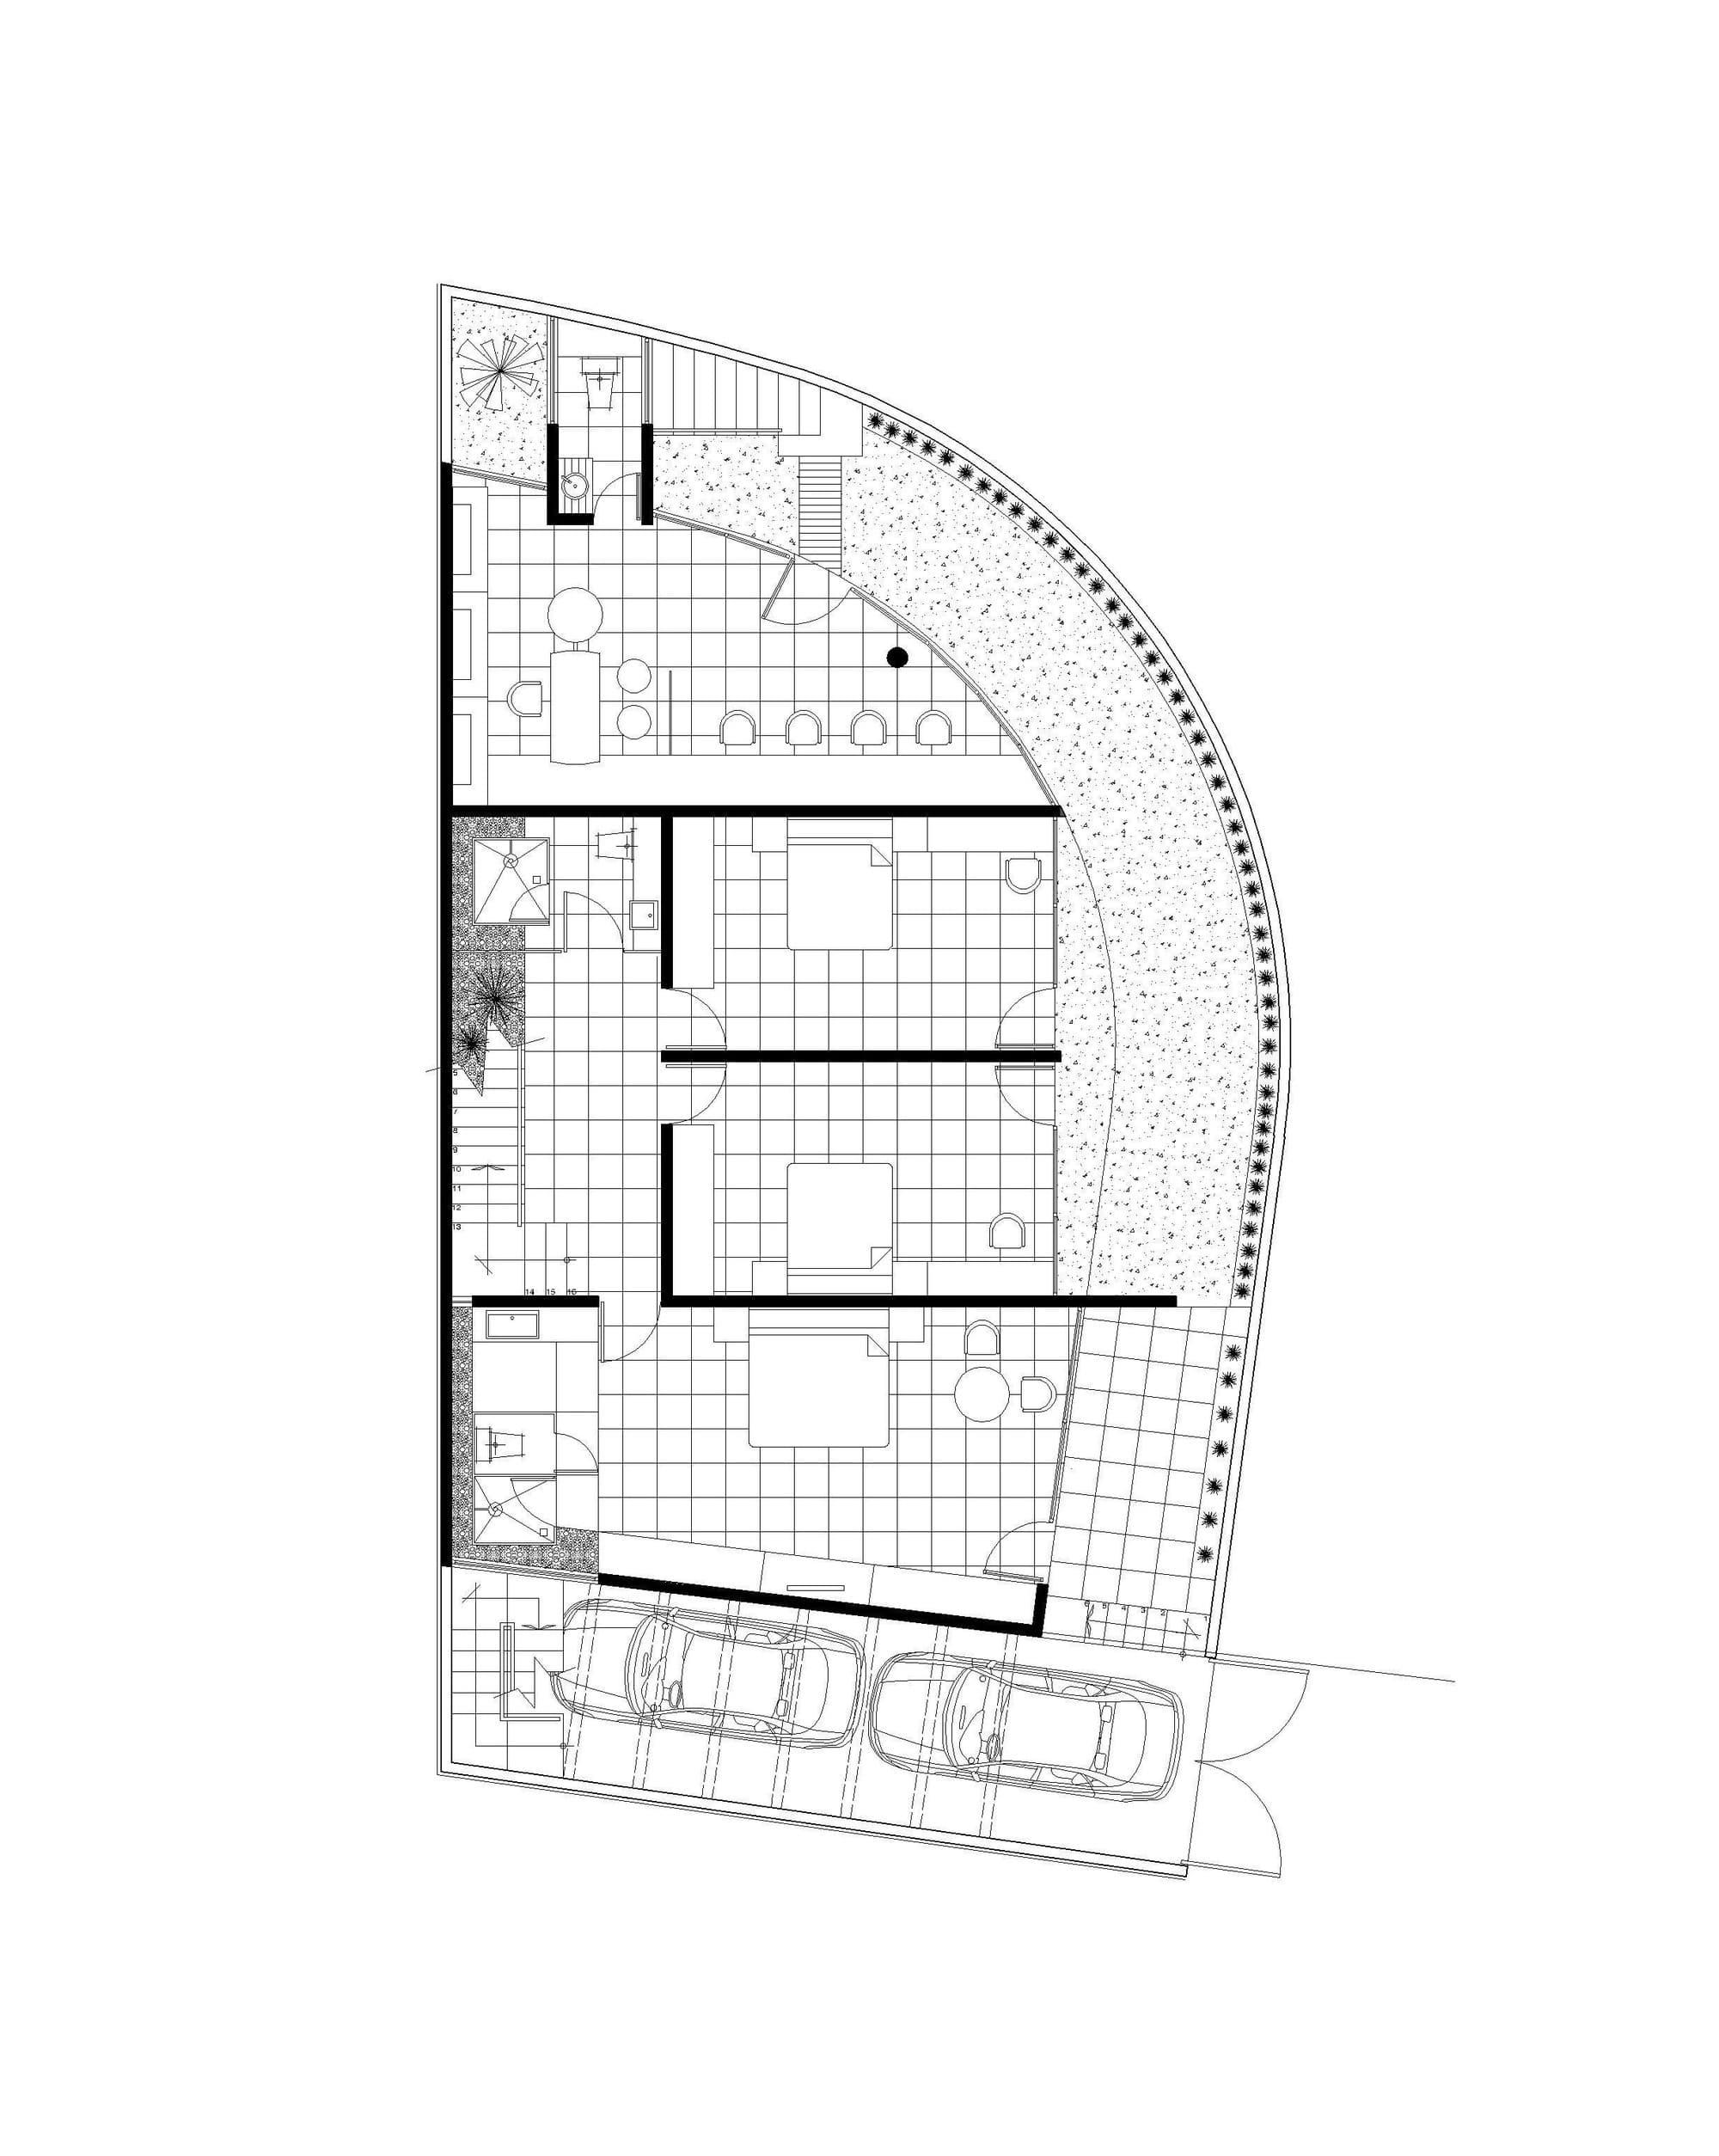 Casa moderna dos pisos tres dormitorios construye hogar for Arquitectura planos y disenos